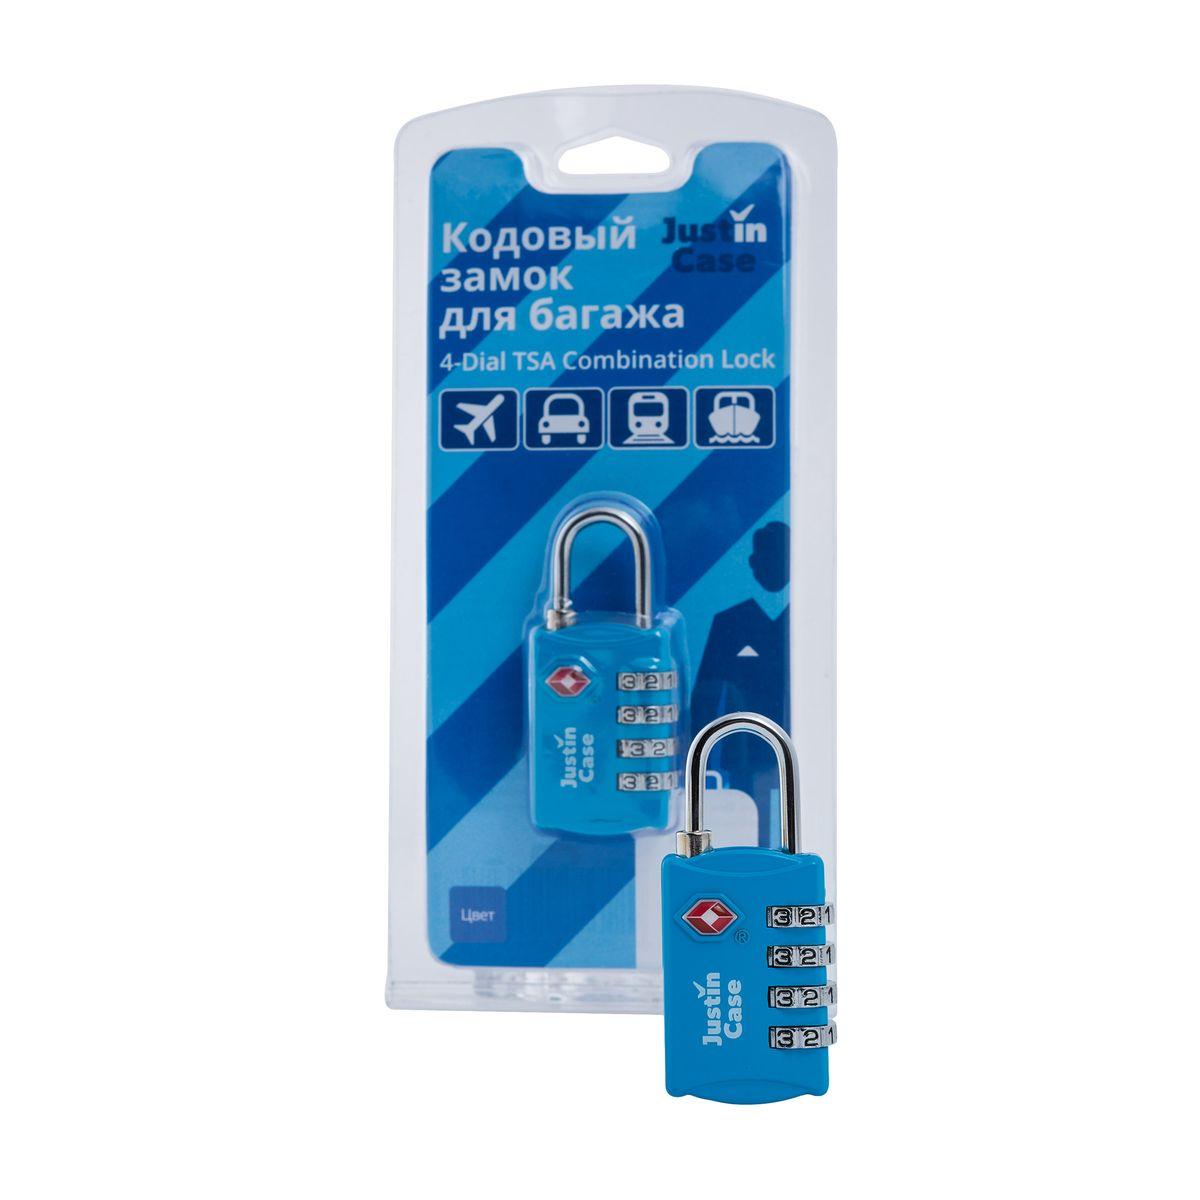 Замок кодовый для багажа JustinCase  4-Dial TSA Combination Lock , цвет: голубой - Замки для багажа